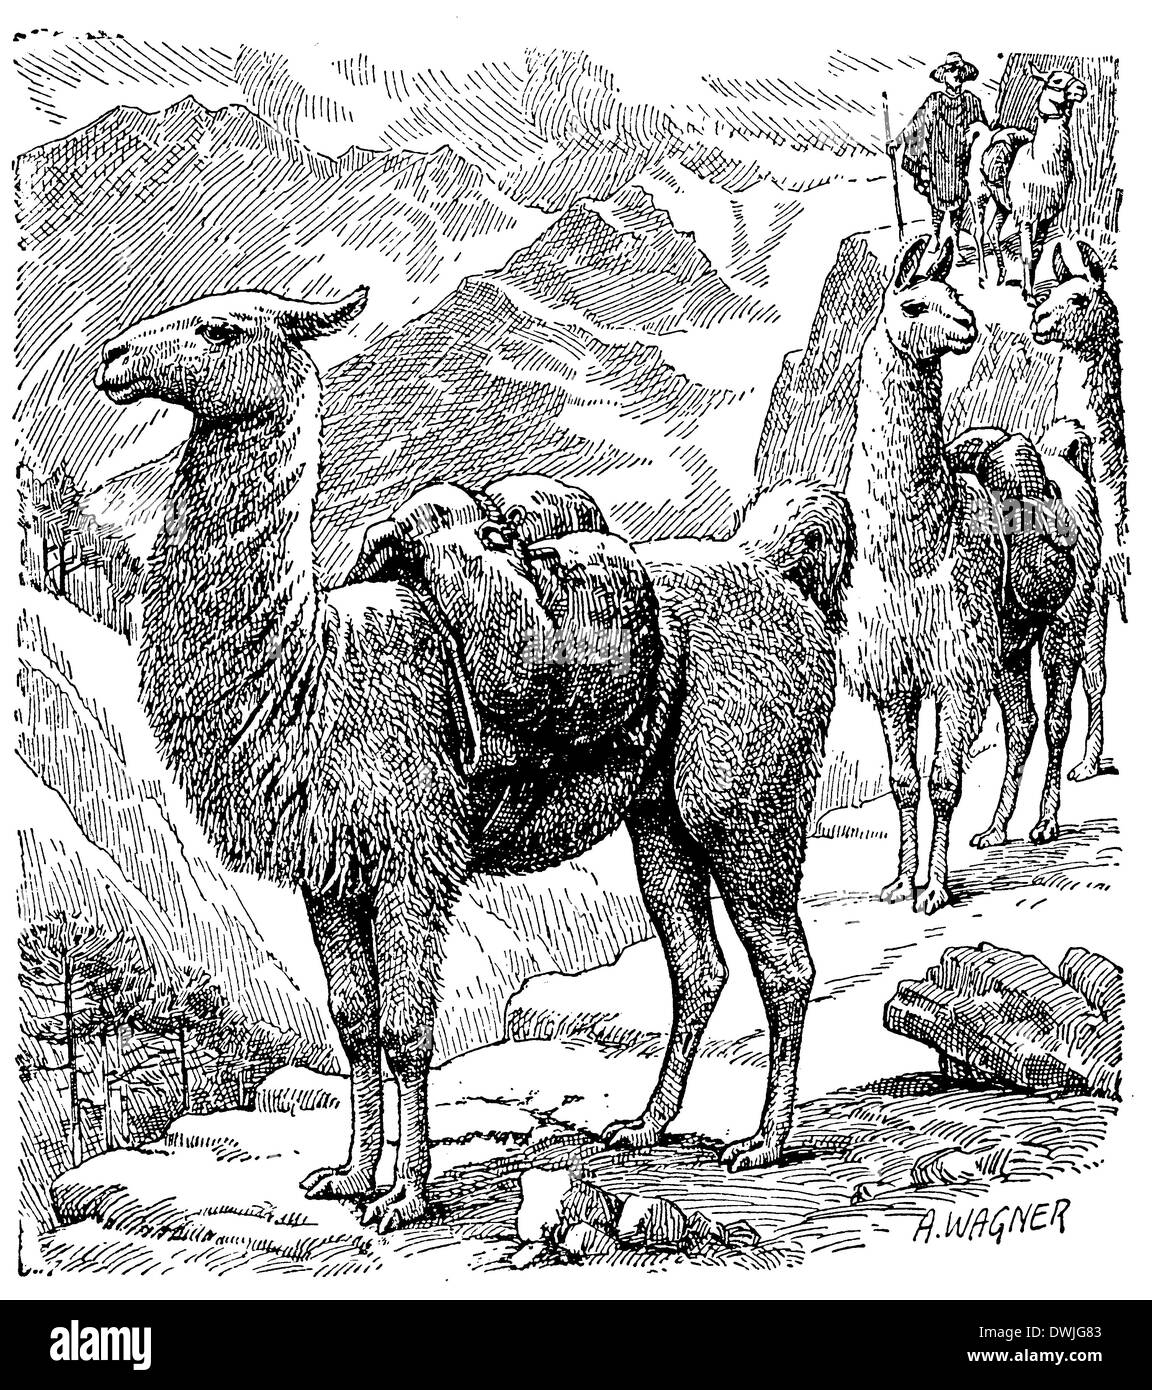 Lama - Stock Image